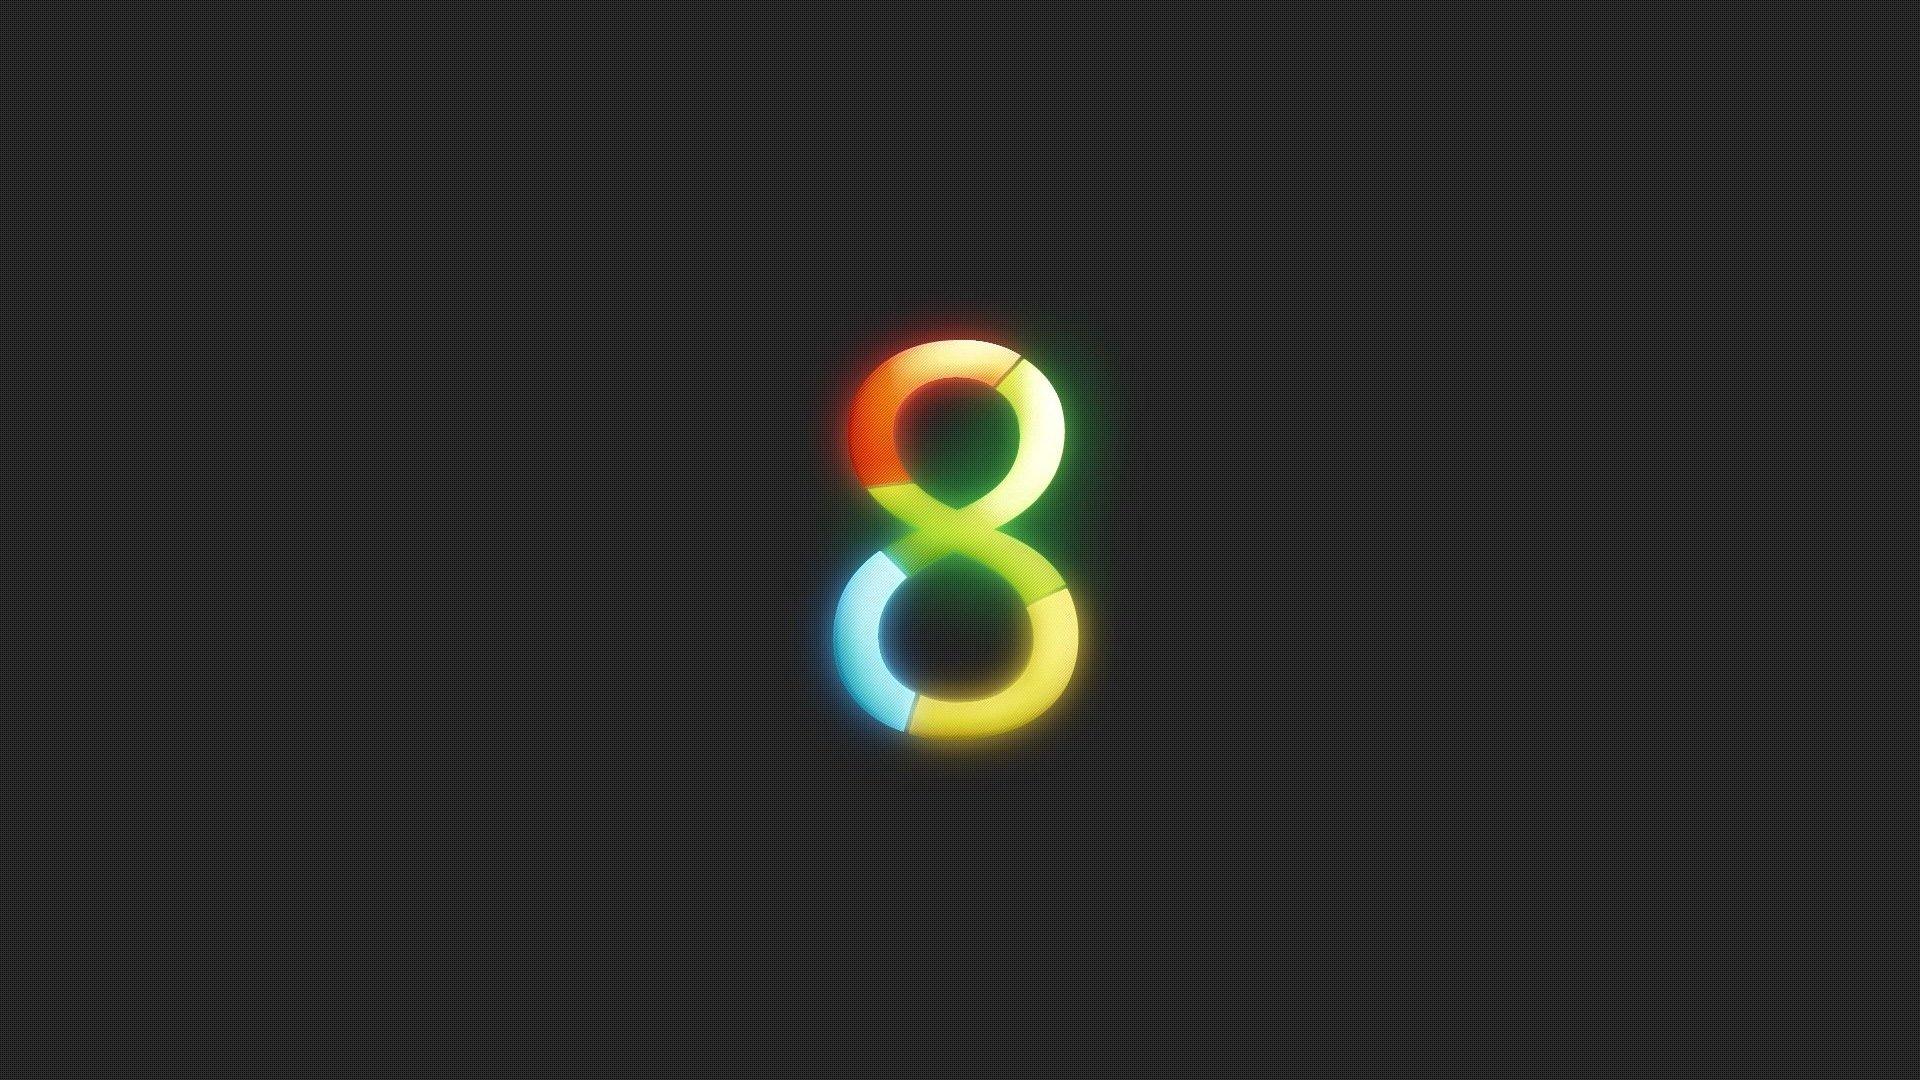 hd, Windows 8, логотип, восьмерка, серый фон